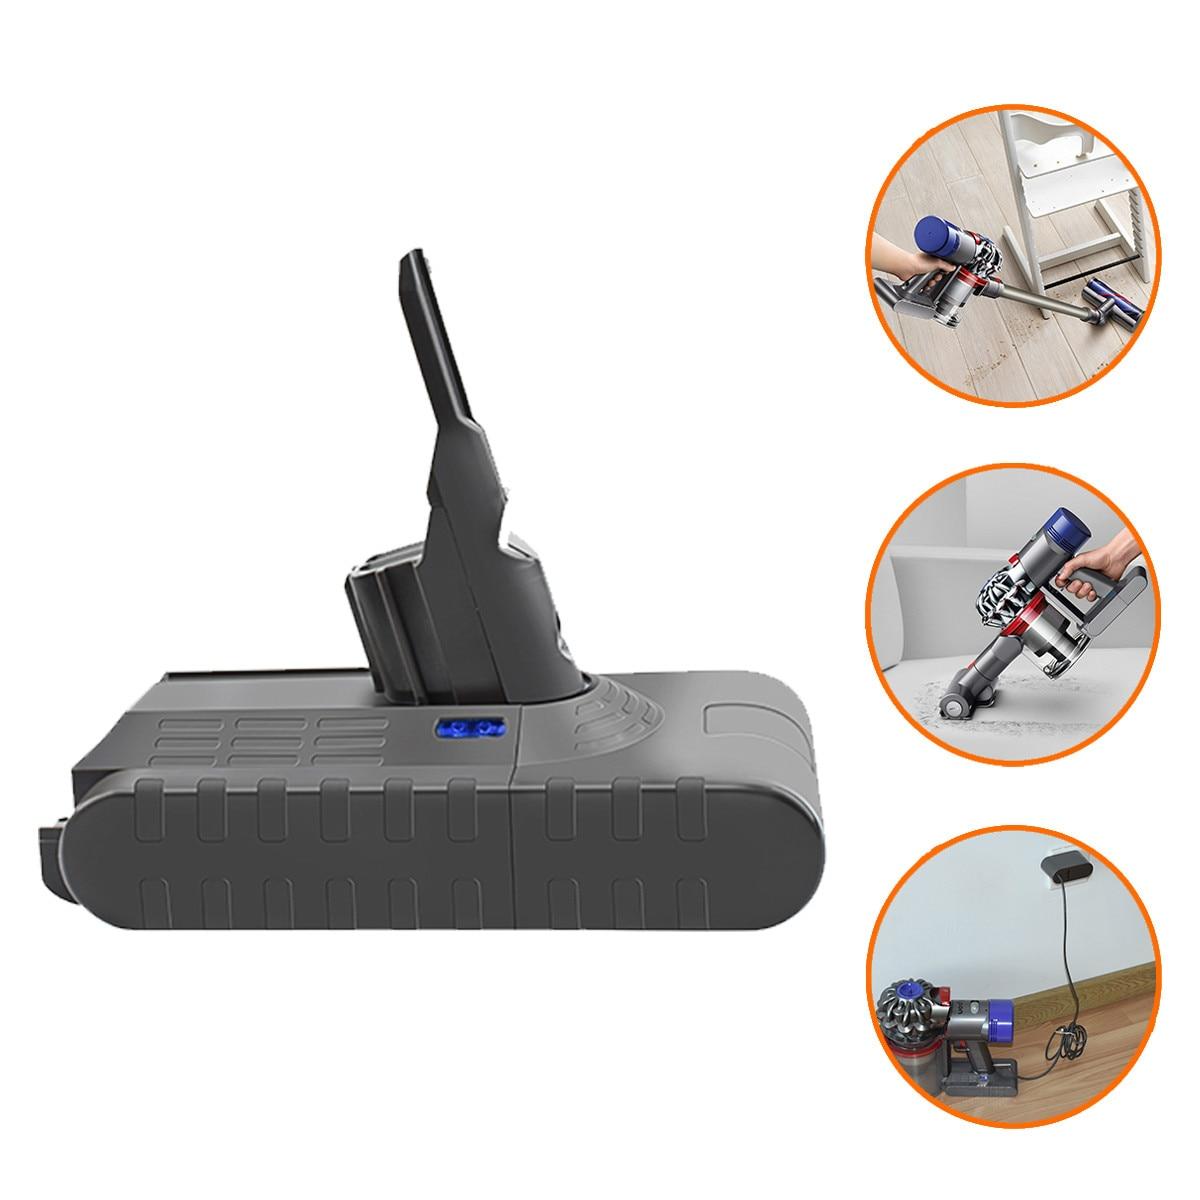 Bonadget 4000mAh 21.6V 18650 Li-ion Battery For Dyson V8 Battery Handheld Vacuum Cleaner Rechargeable Power Tools Battery